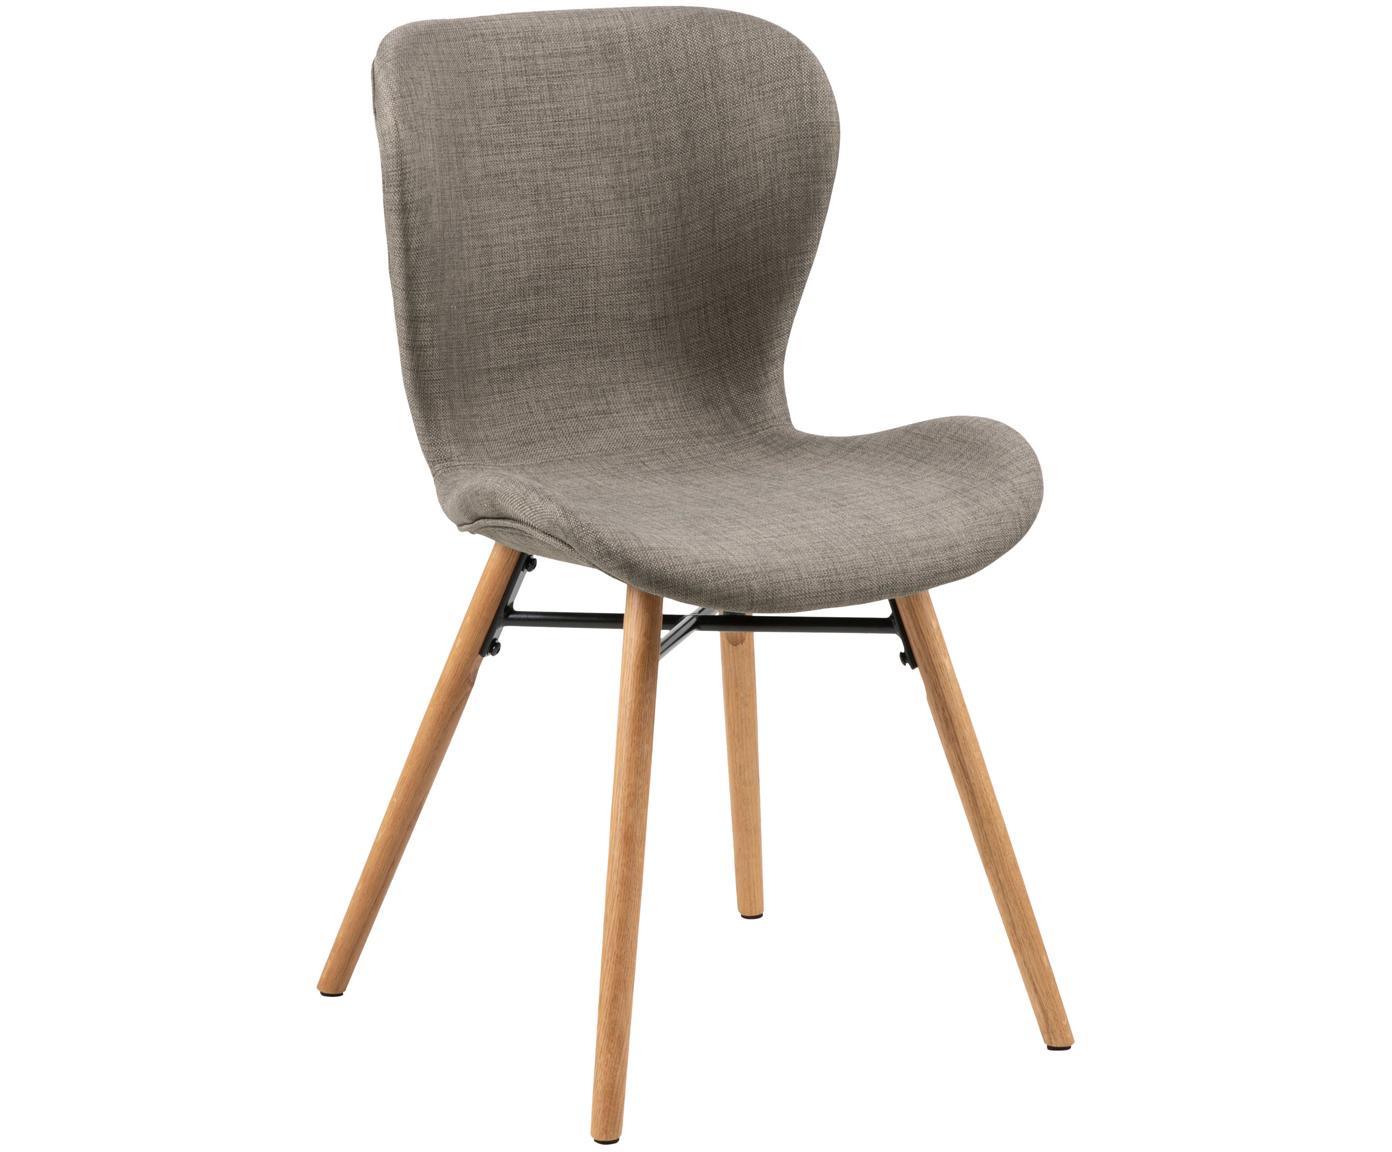 Gestoffeerde stoelen Batilda in scandi design, 2 stuks, Bekleding: polyester, Poten: gelakt en geolied massief, Kakigroen, 56 x 83 cm